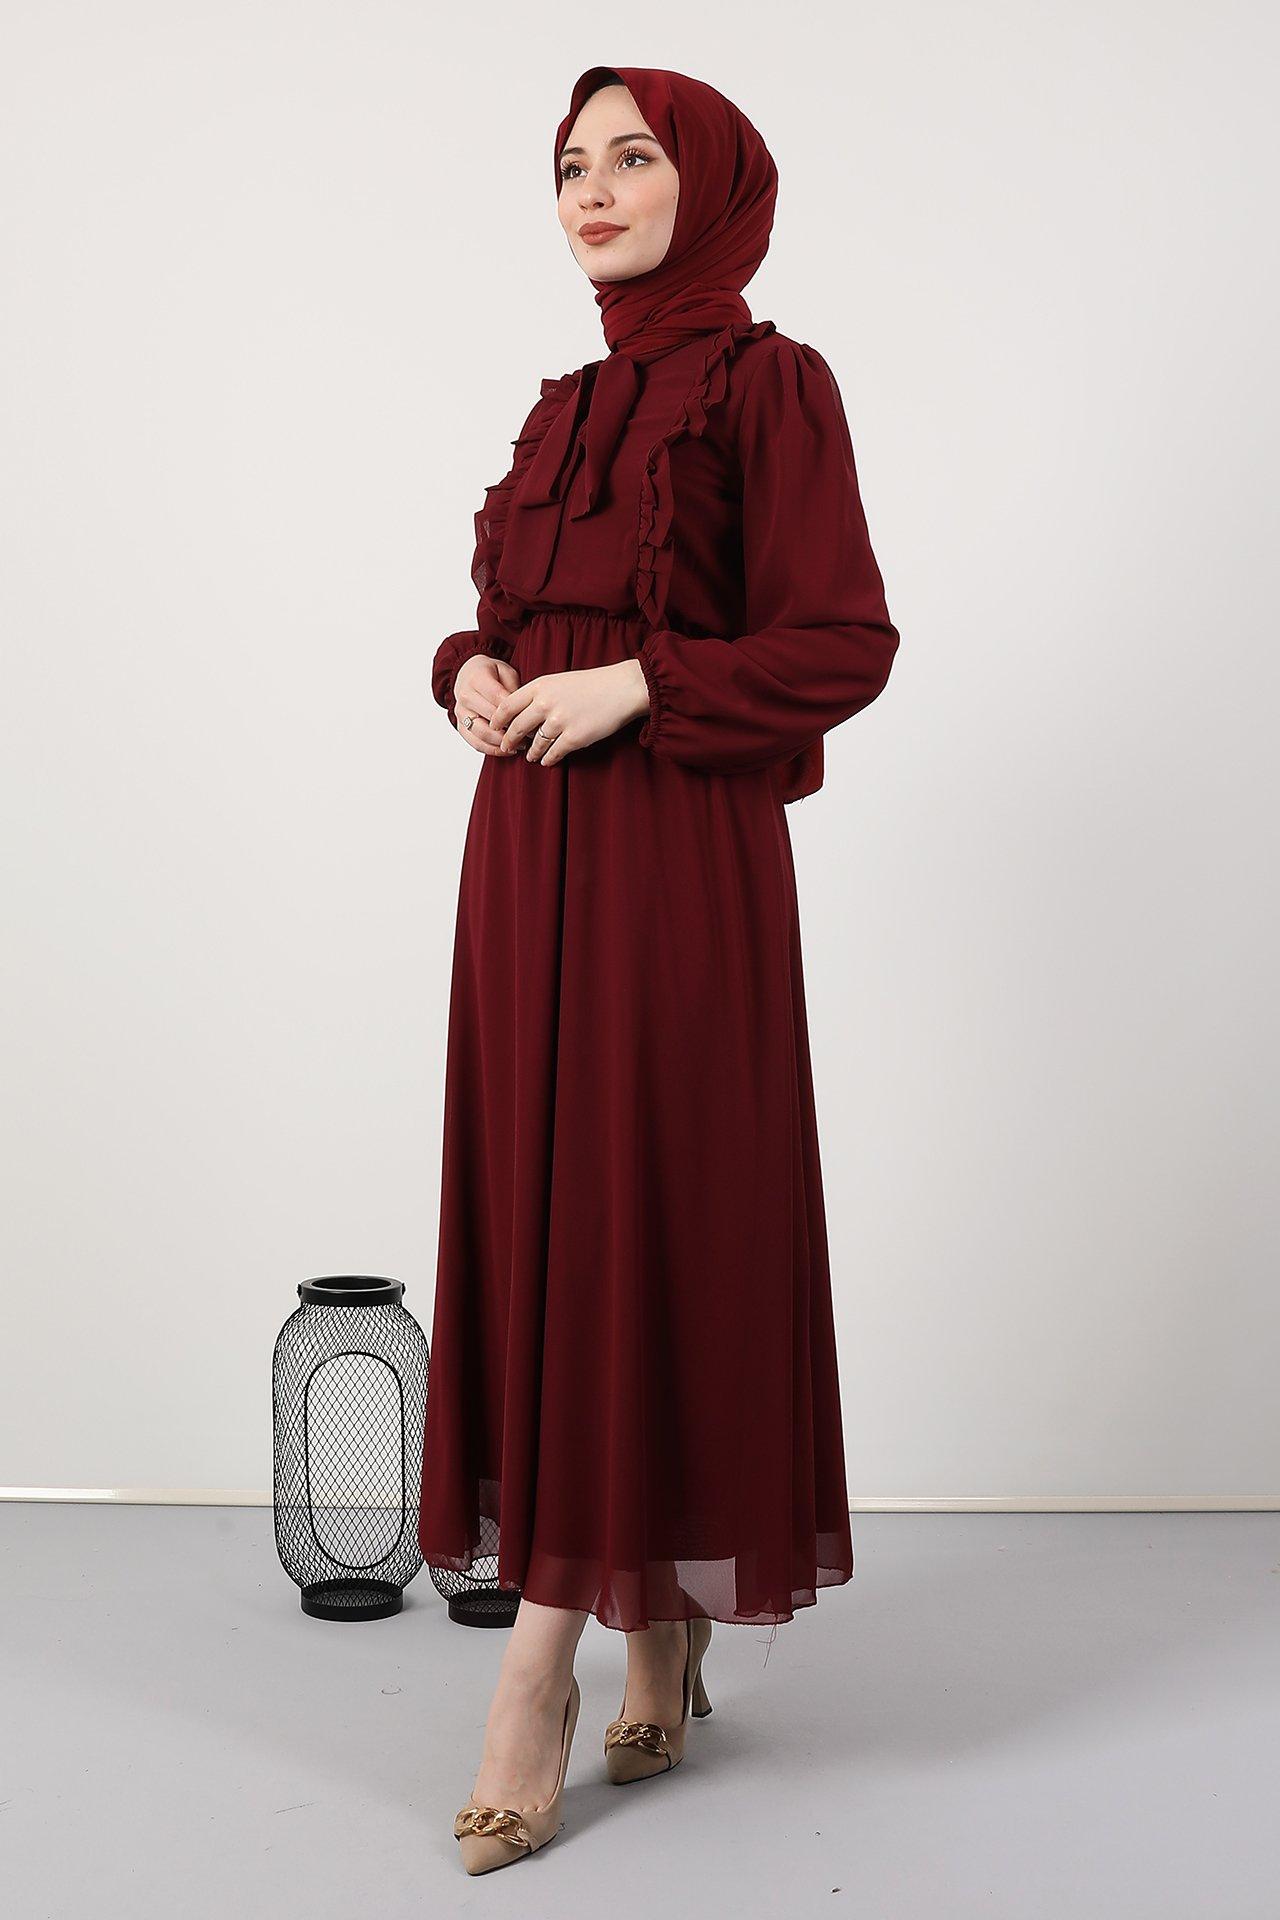 GİZAGİYİM - Giza Beli Lastikli Fırfırlı Elbise Bordo